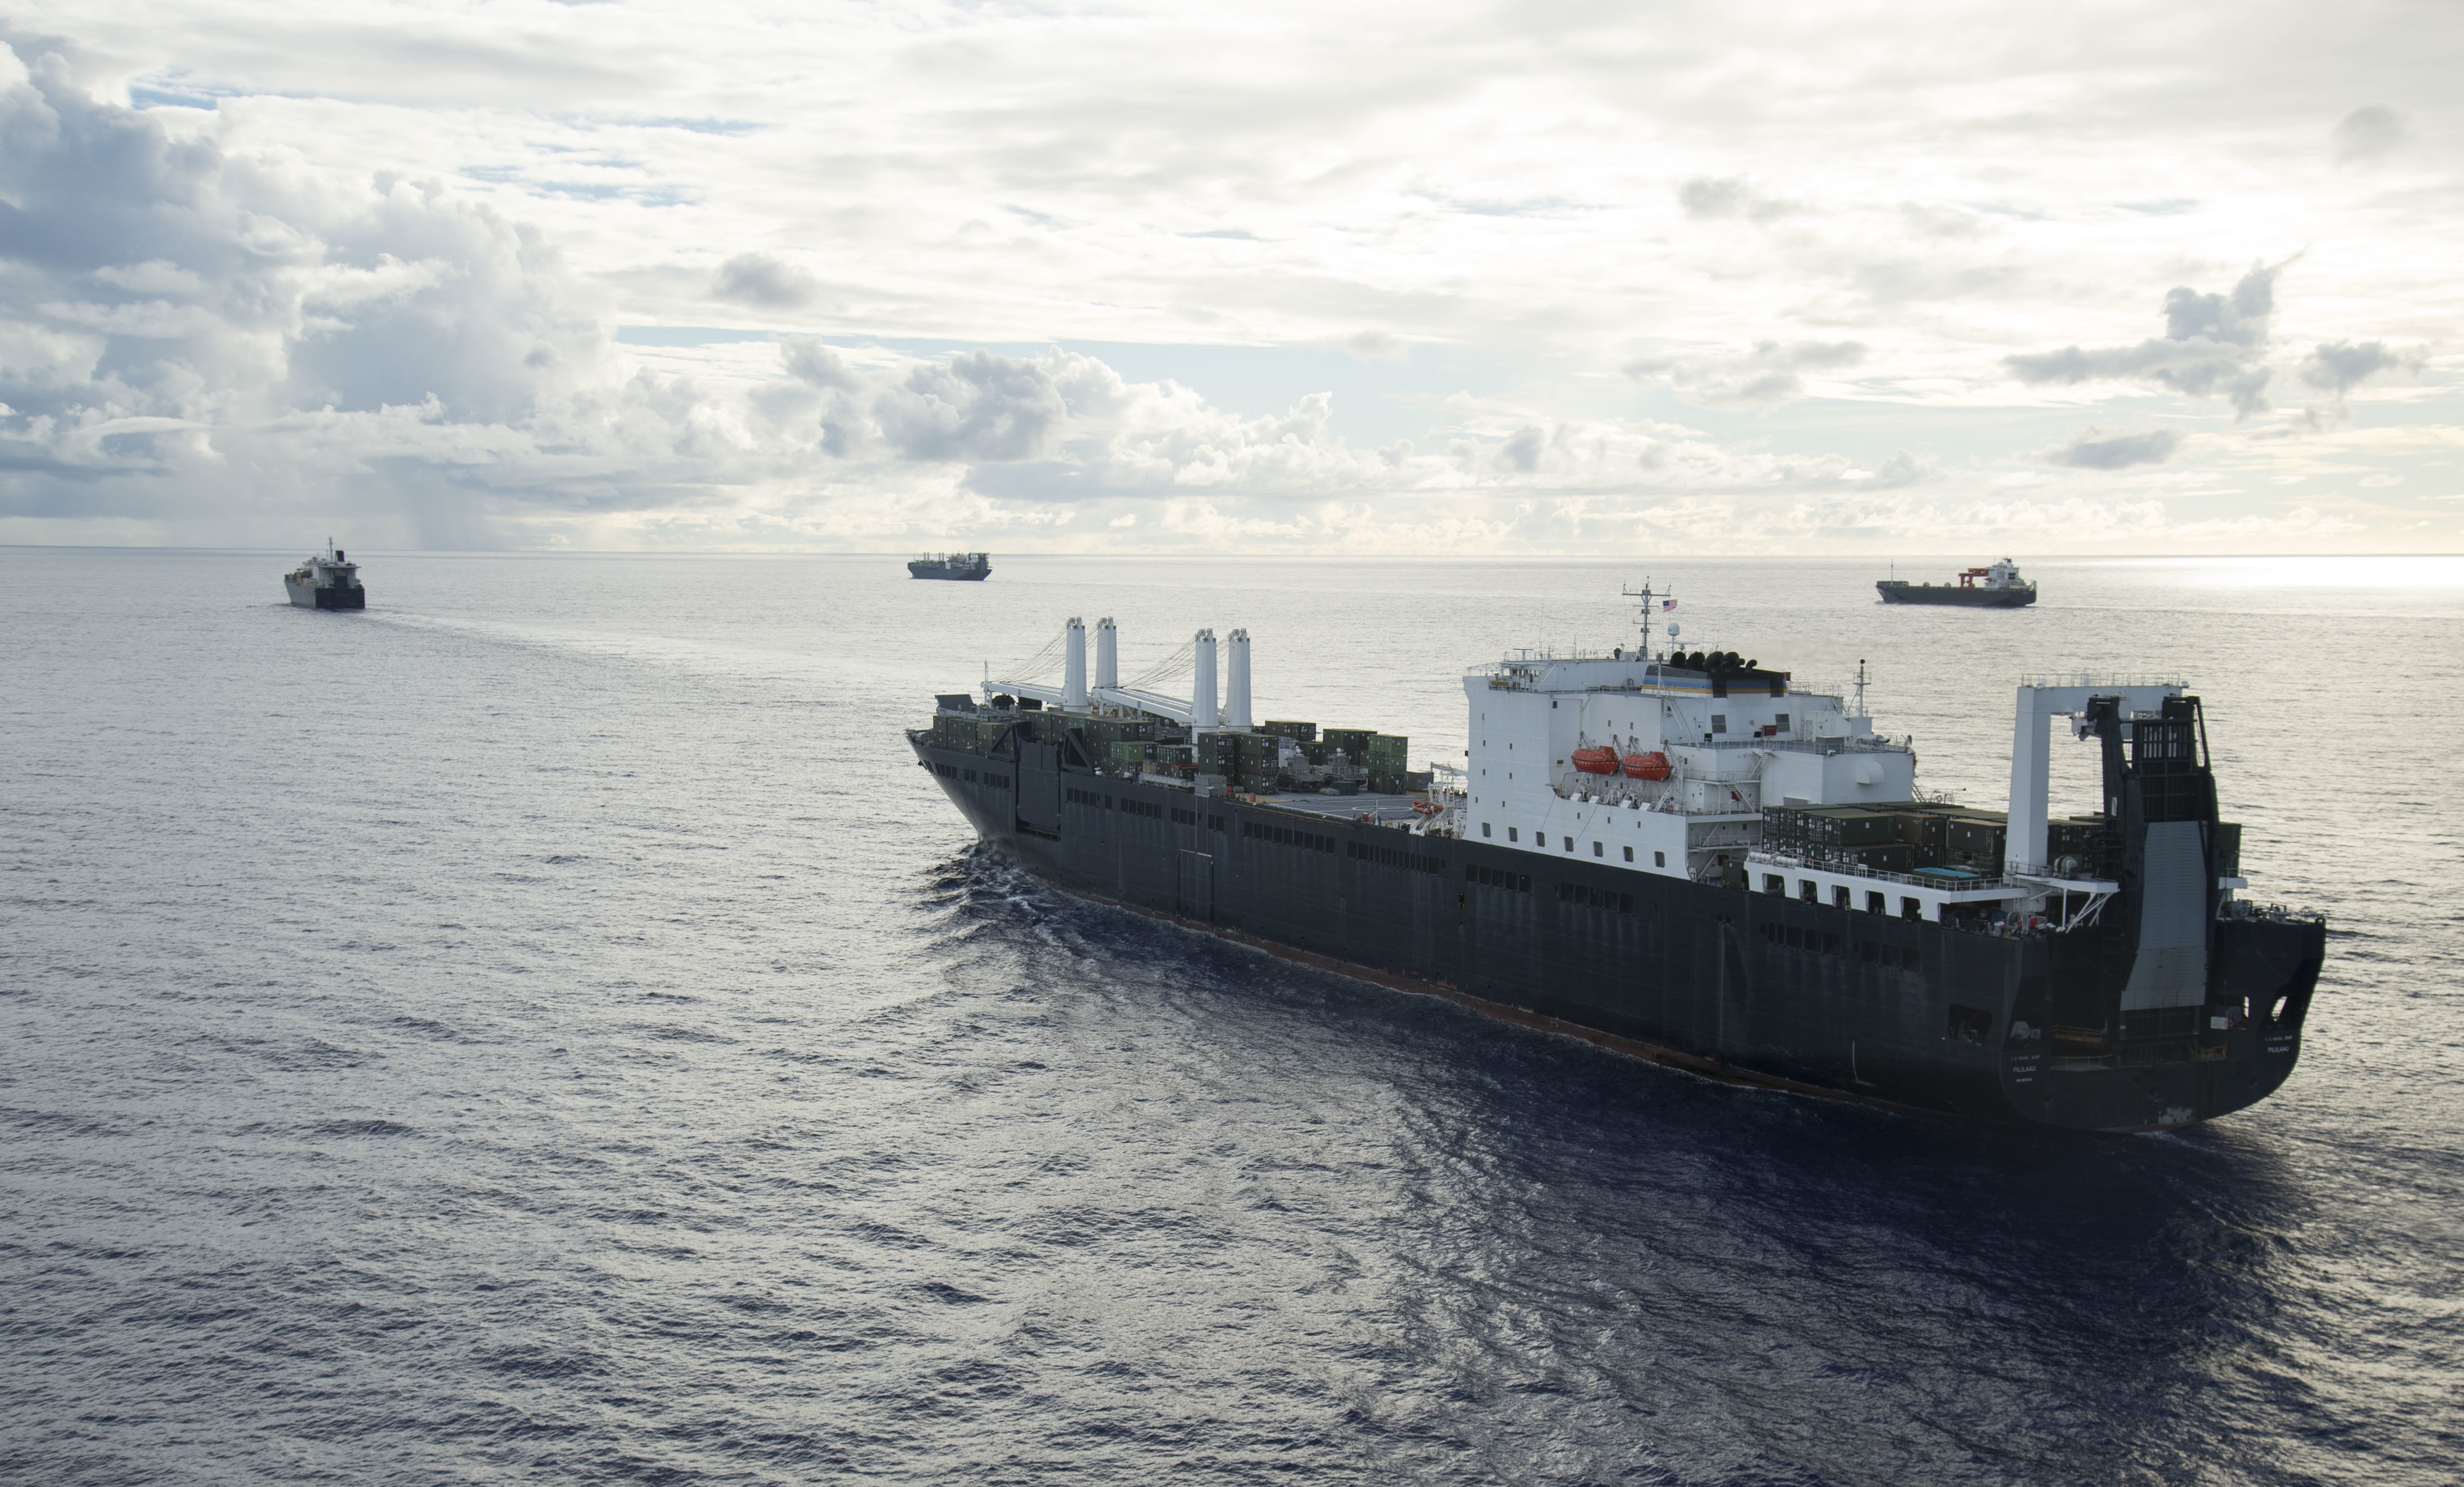 USNS Pililaau (T-AK 304) executes a Group Sail with Maritime Prepositioning Ships Squadron (MPSRON 3) off the coast of Guam, Oct. 4, 2017.